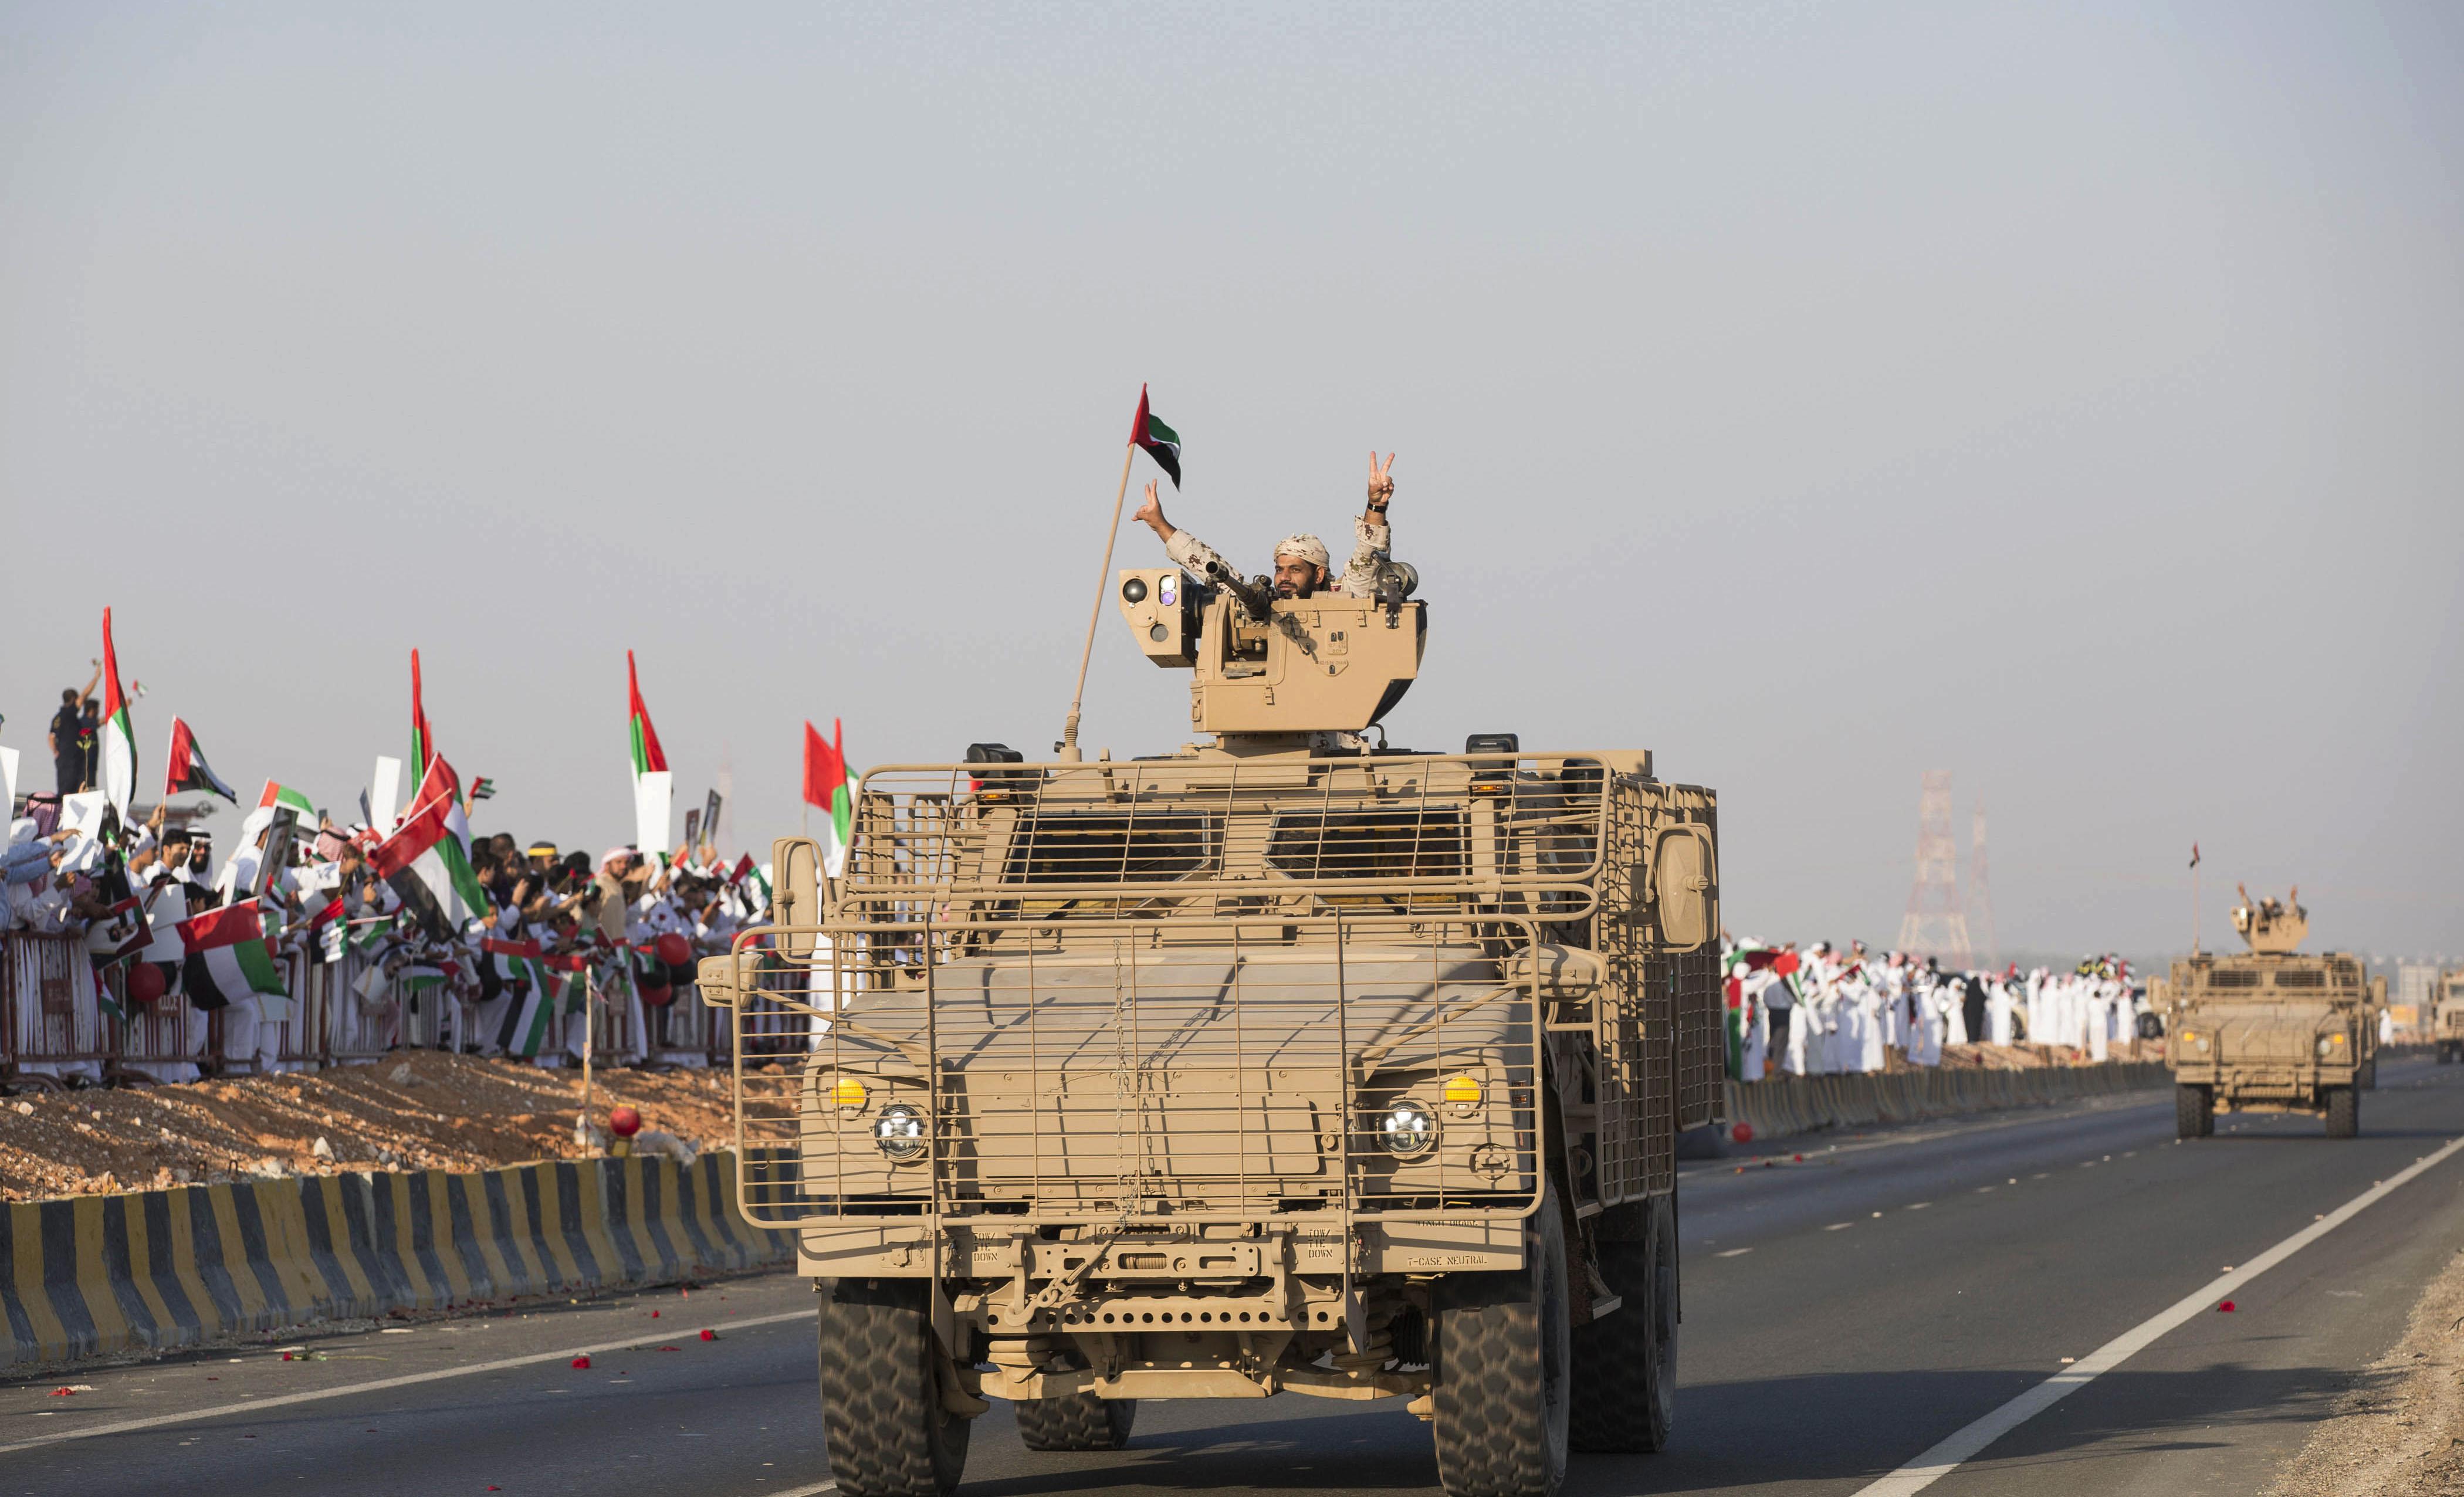 UAE Not Ended Operations in Yemen